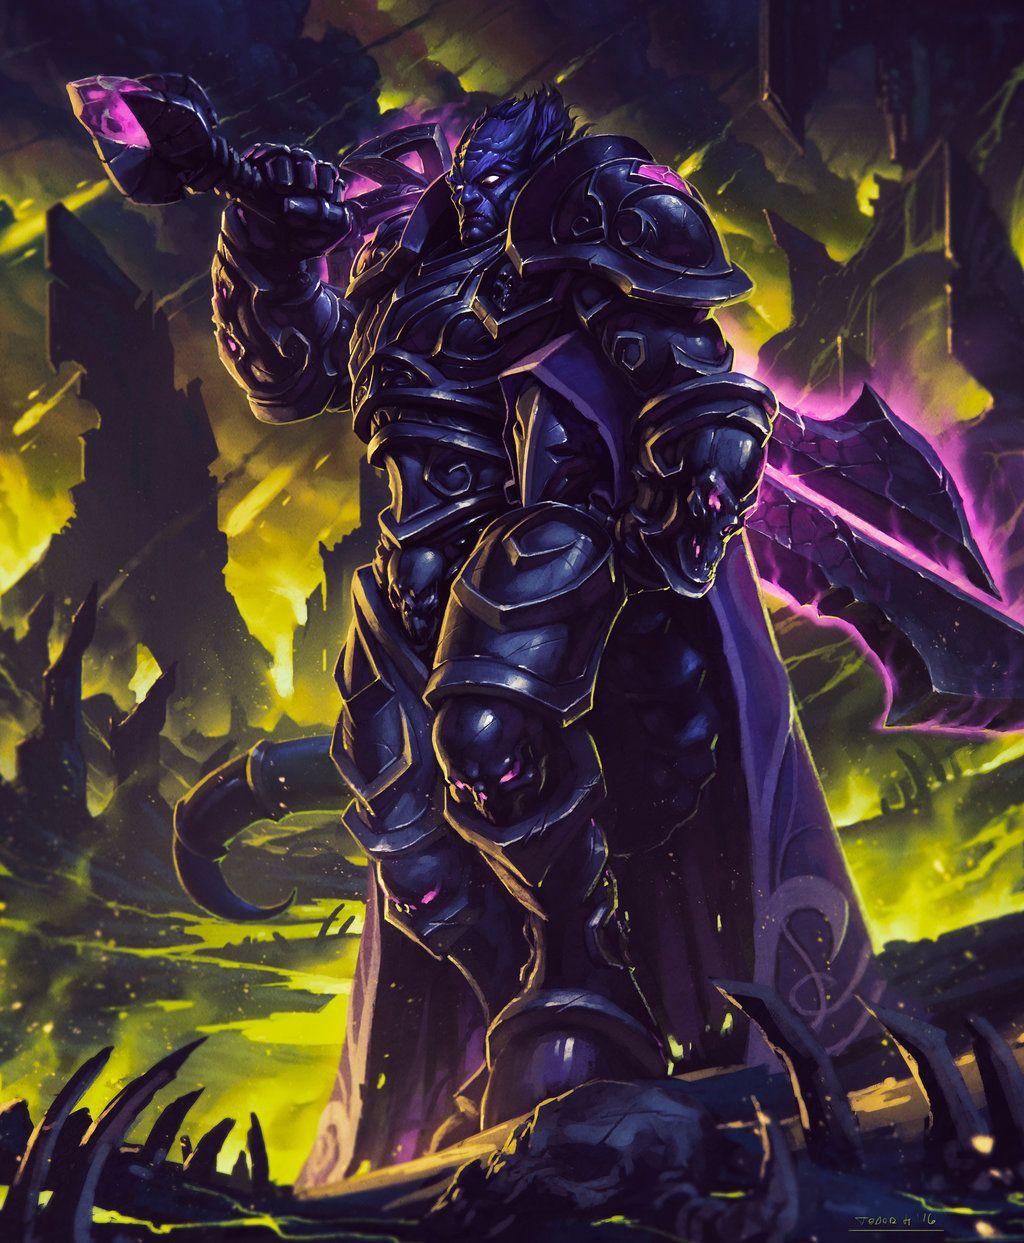 Caelac by draken4o | World of warcraft paladin, Warcraft art, World of warcraft